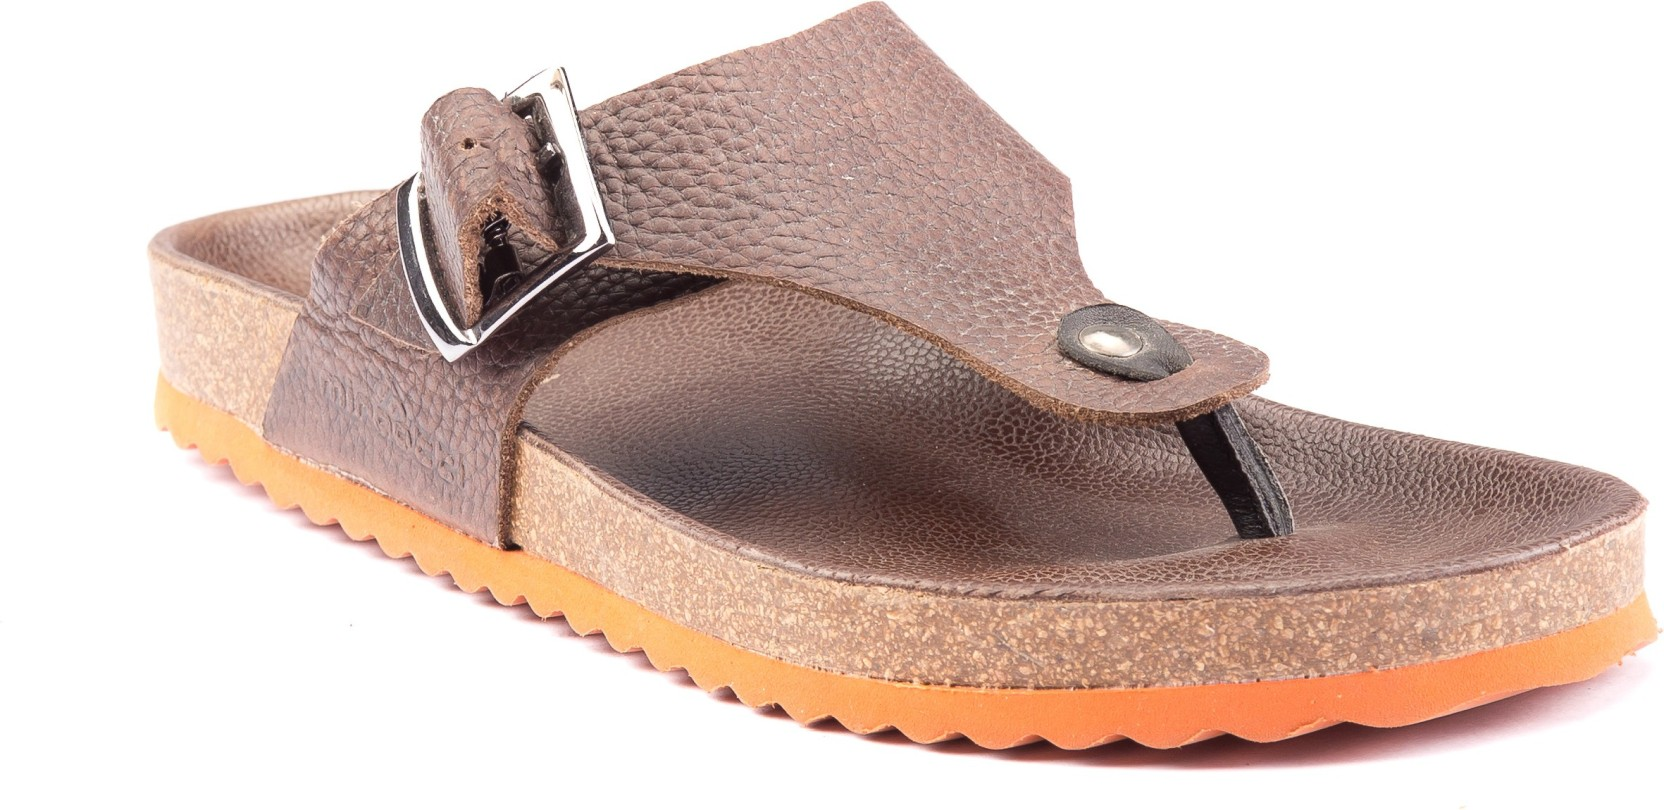 025f7b55dfa Miraatti Men Brown Sandals - Buy Brown Color Miraatti Men Brown ...